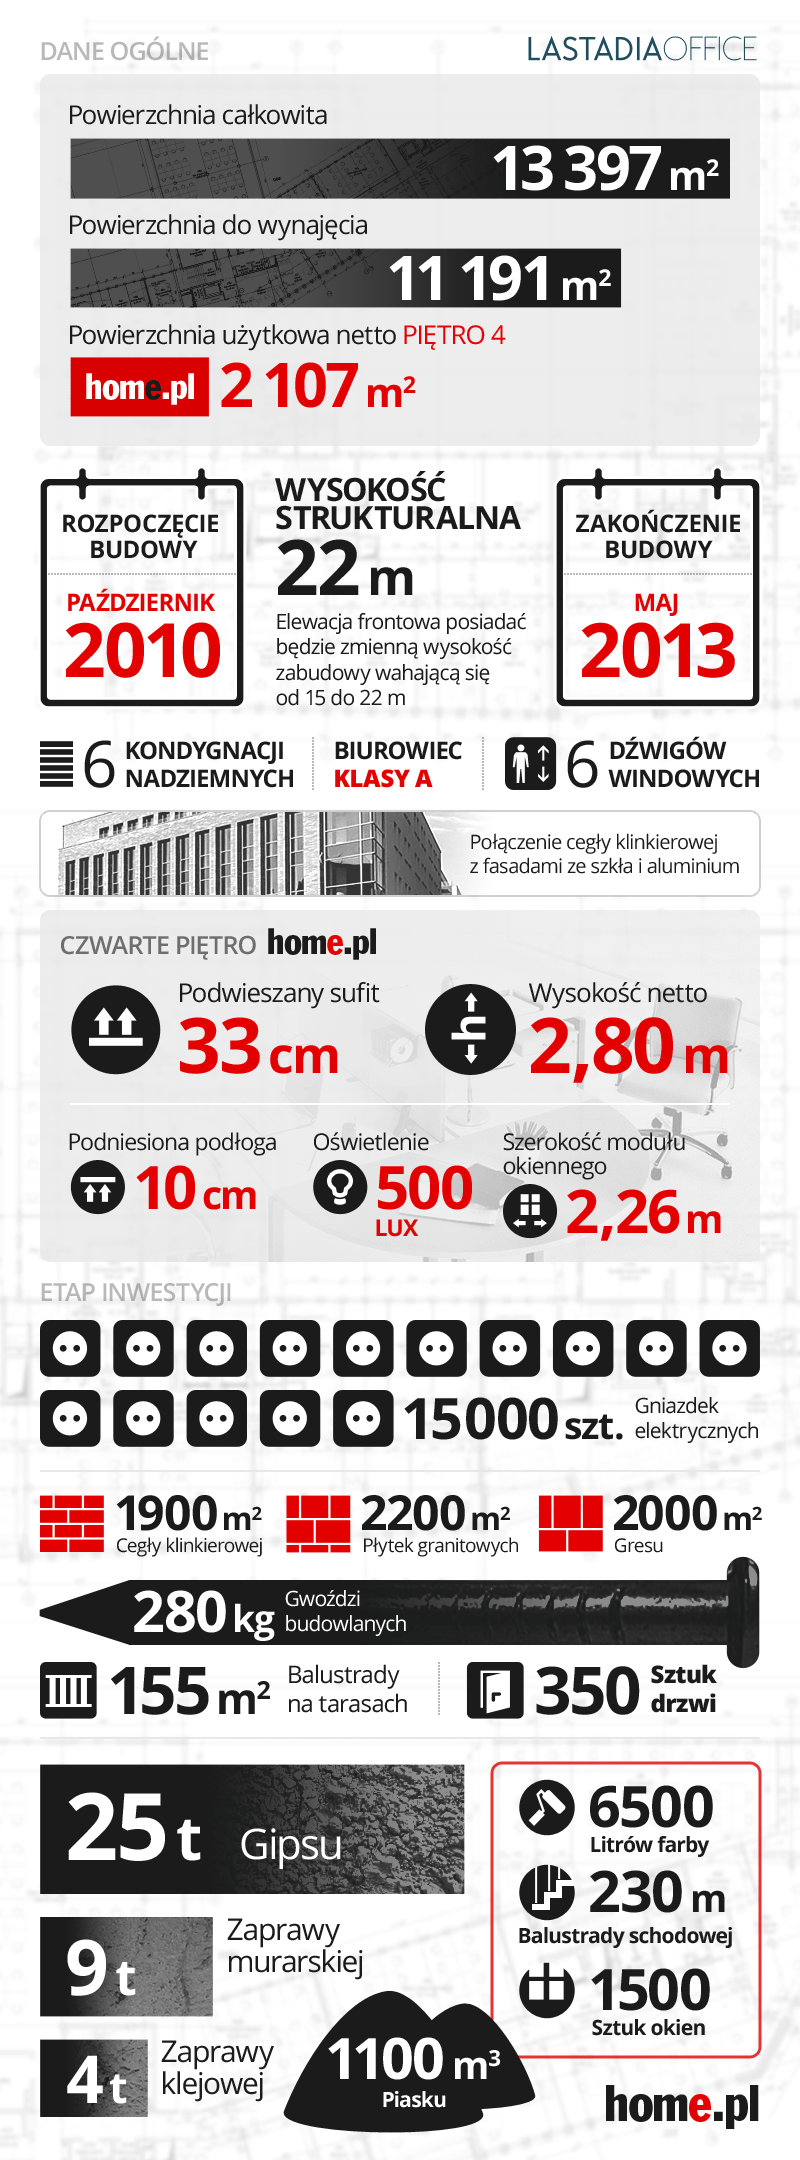 fb-lastadia-infografika-2